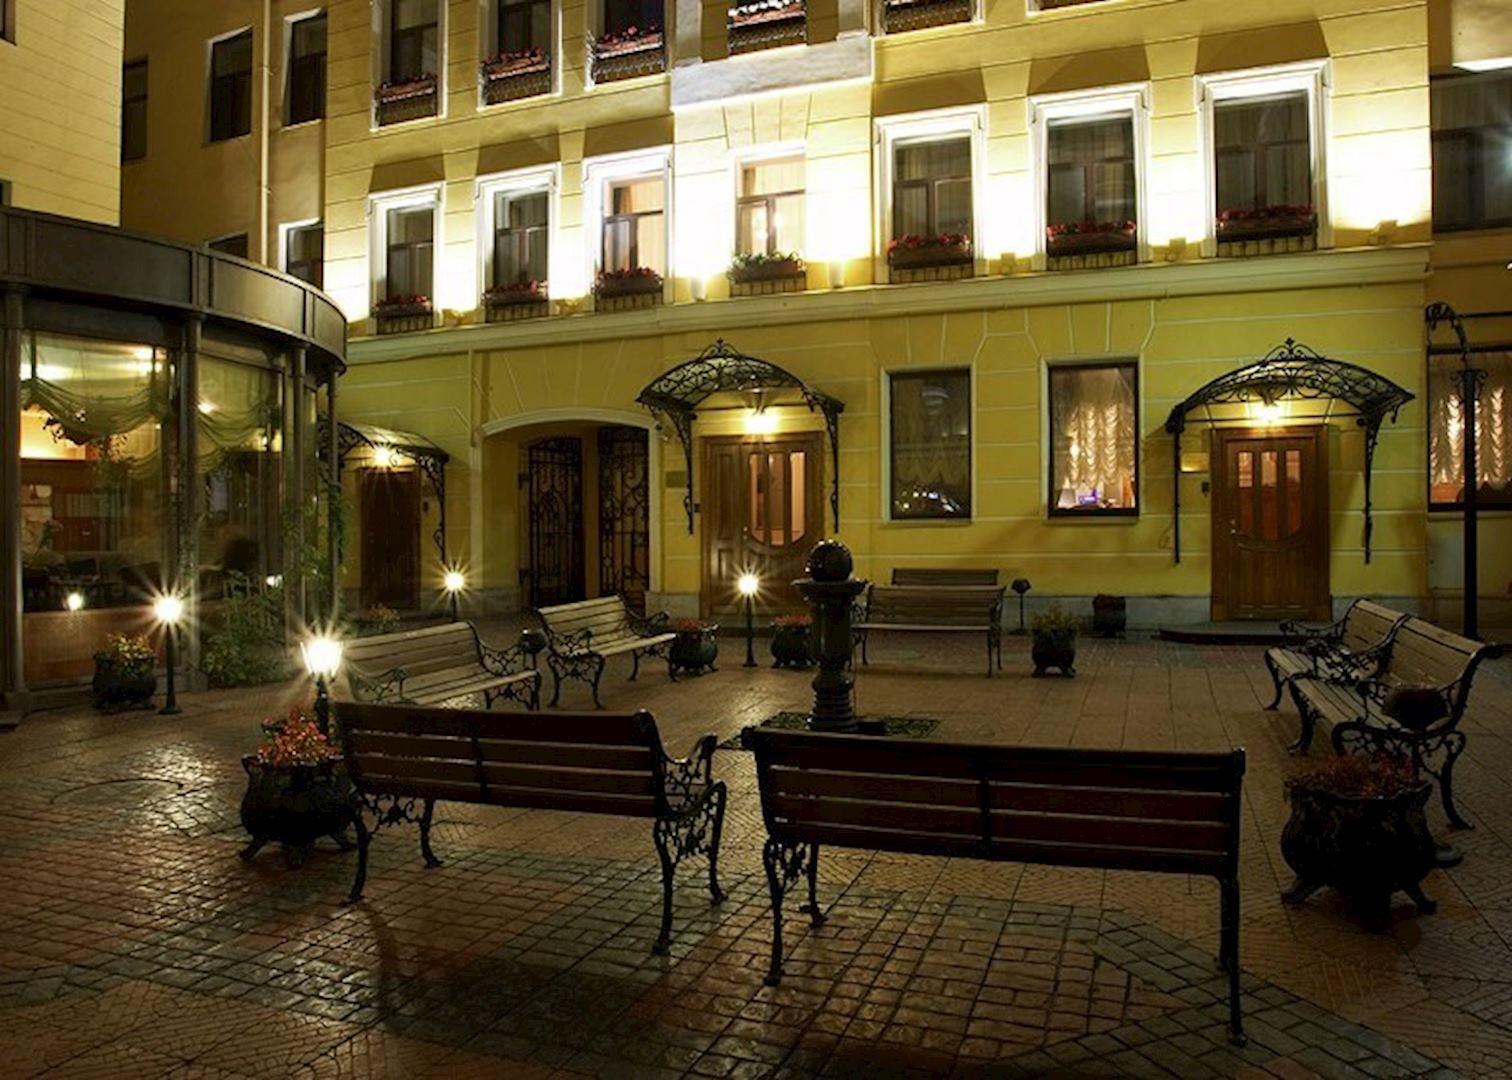 Hotel Helvetia St Petersburg